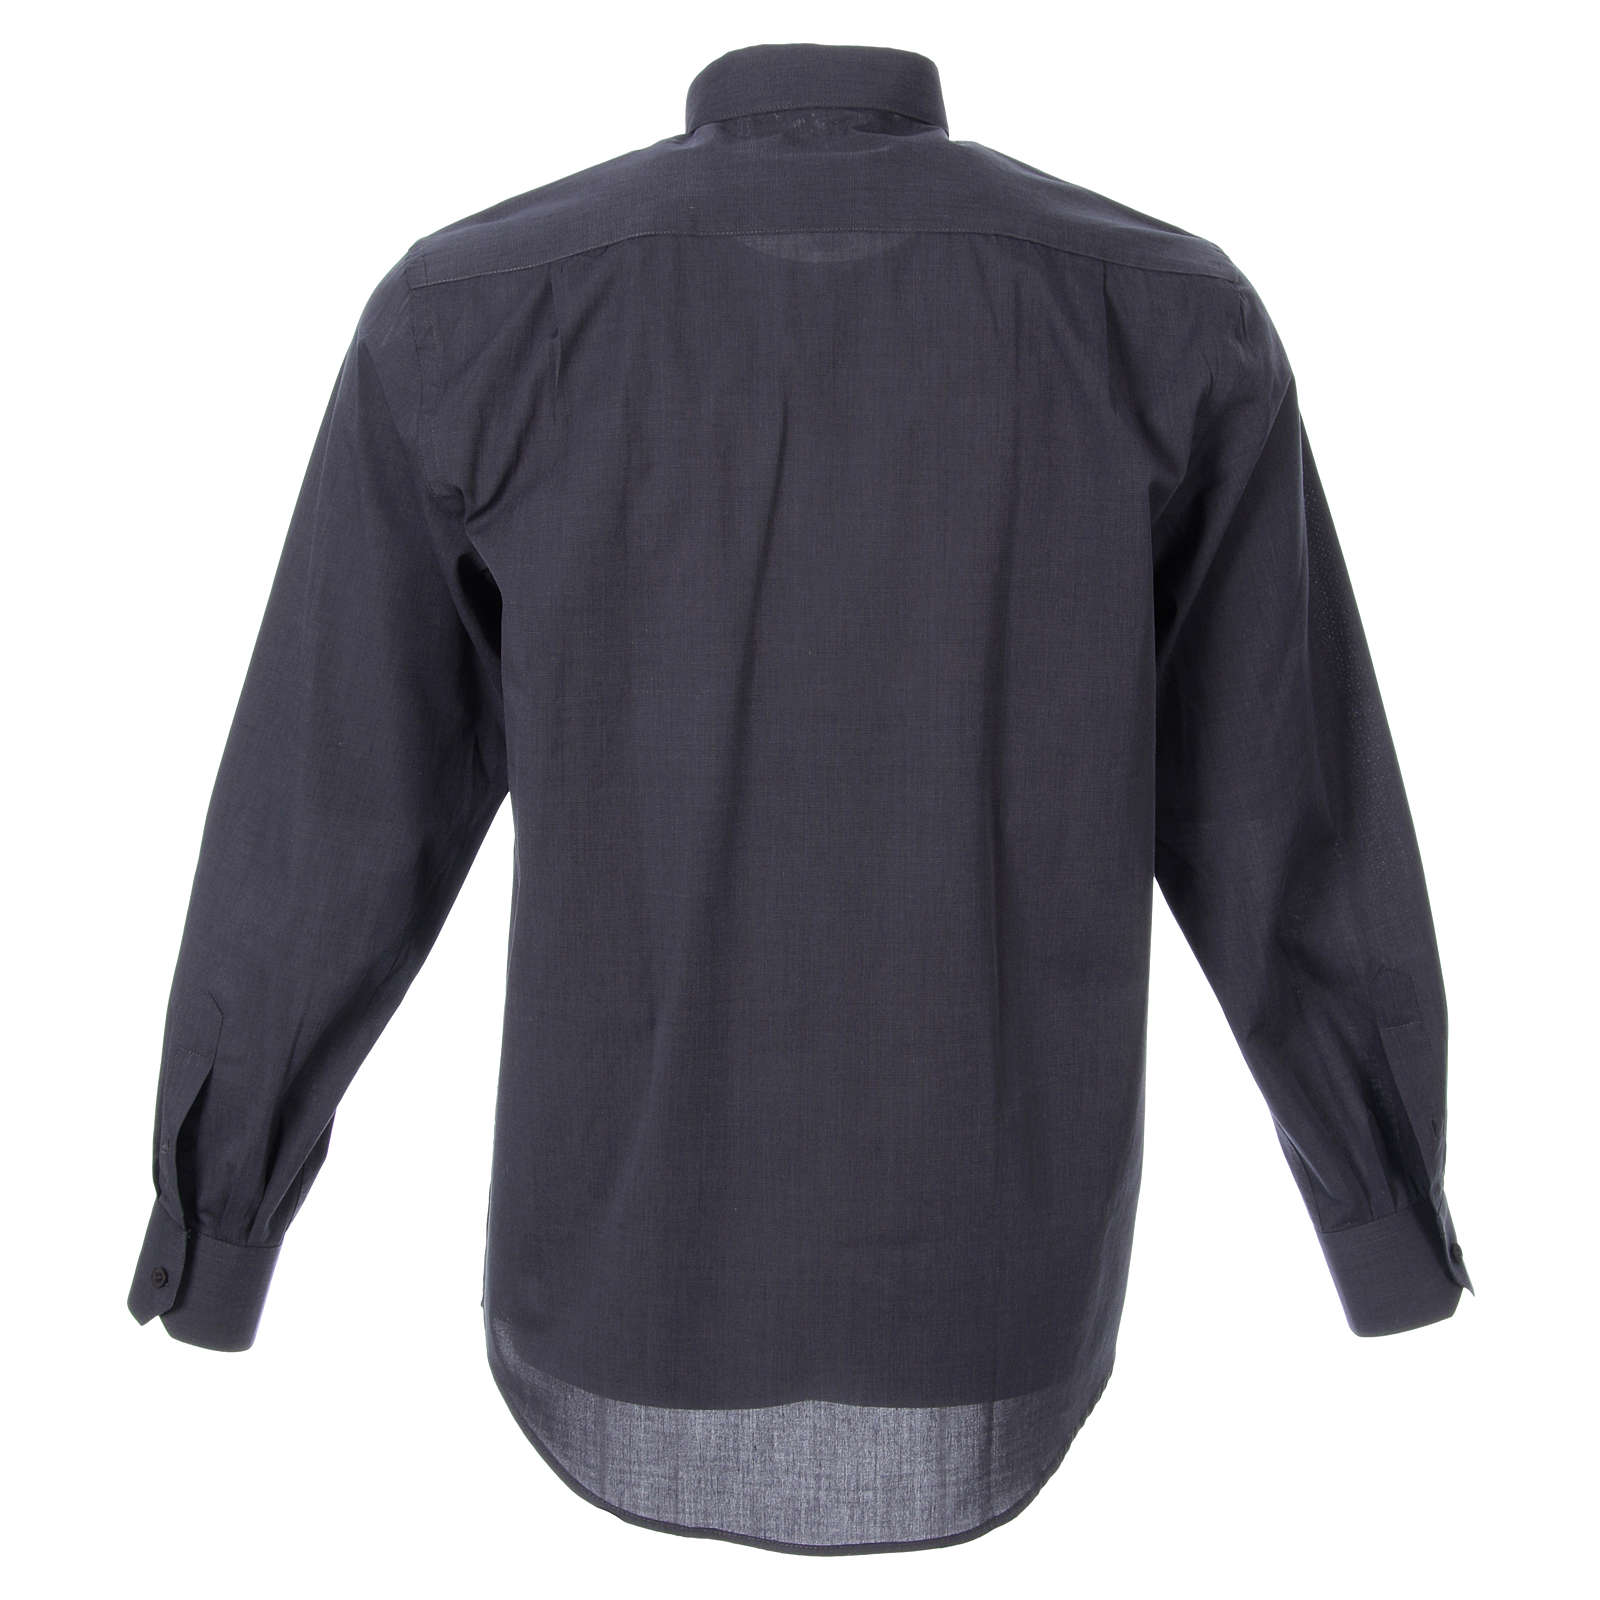 STOCK Clergyman shirt in dark grey fil-a-fil cotton, long sleeves 4